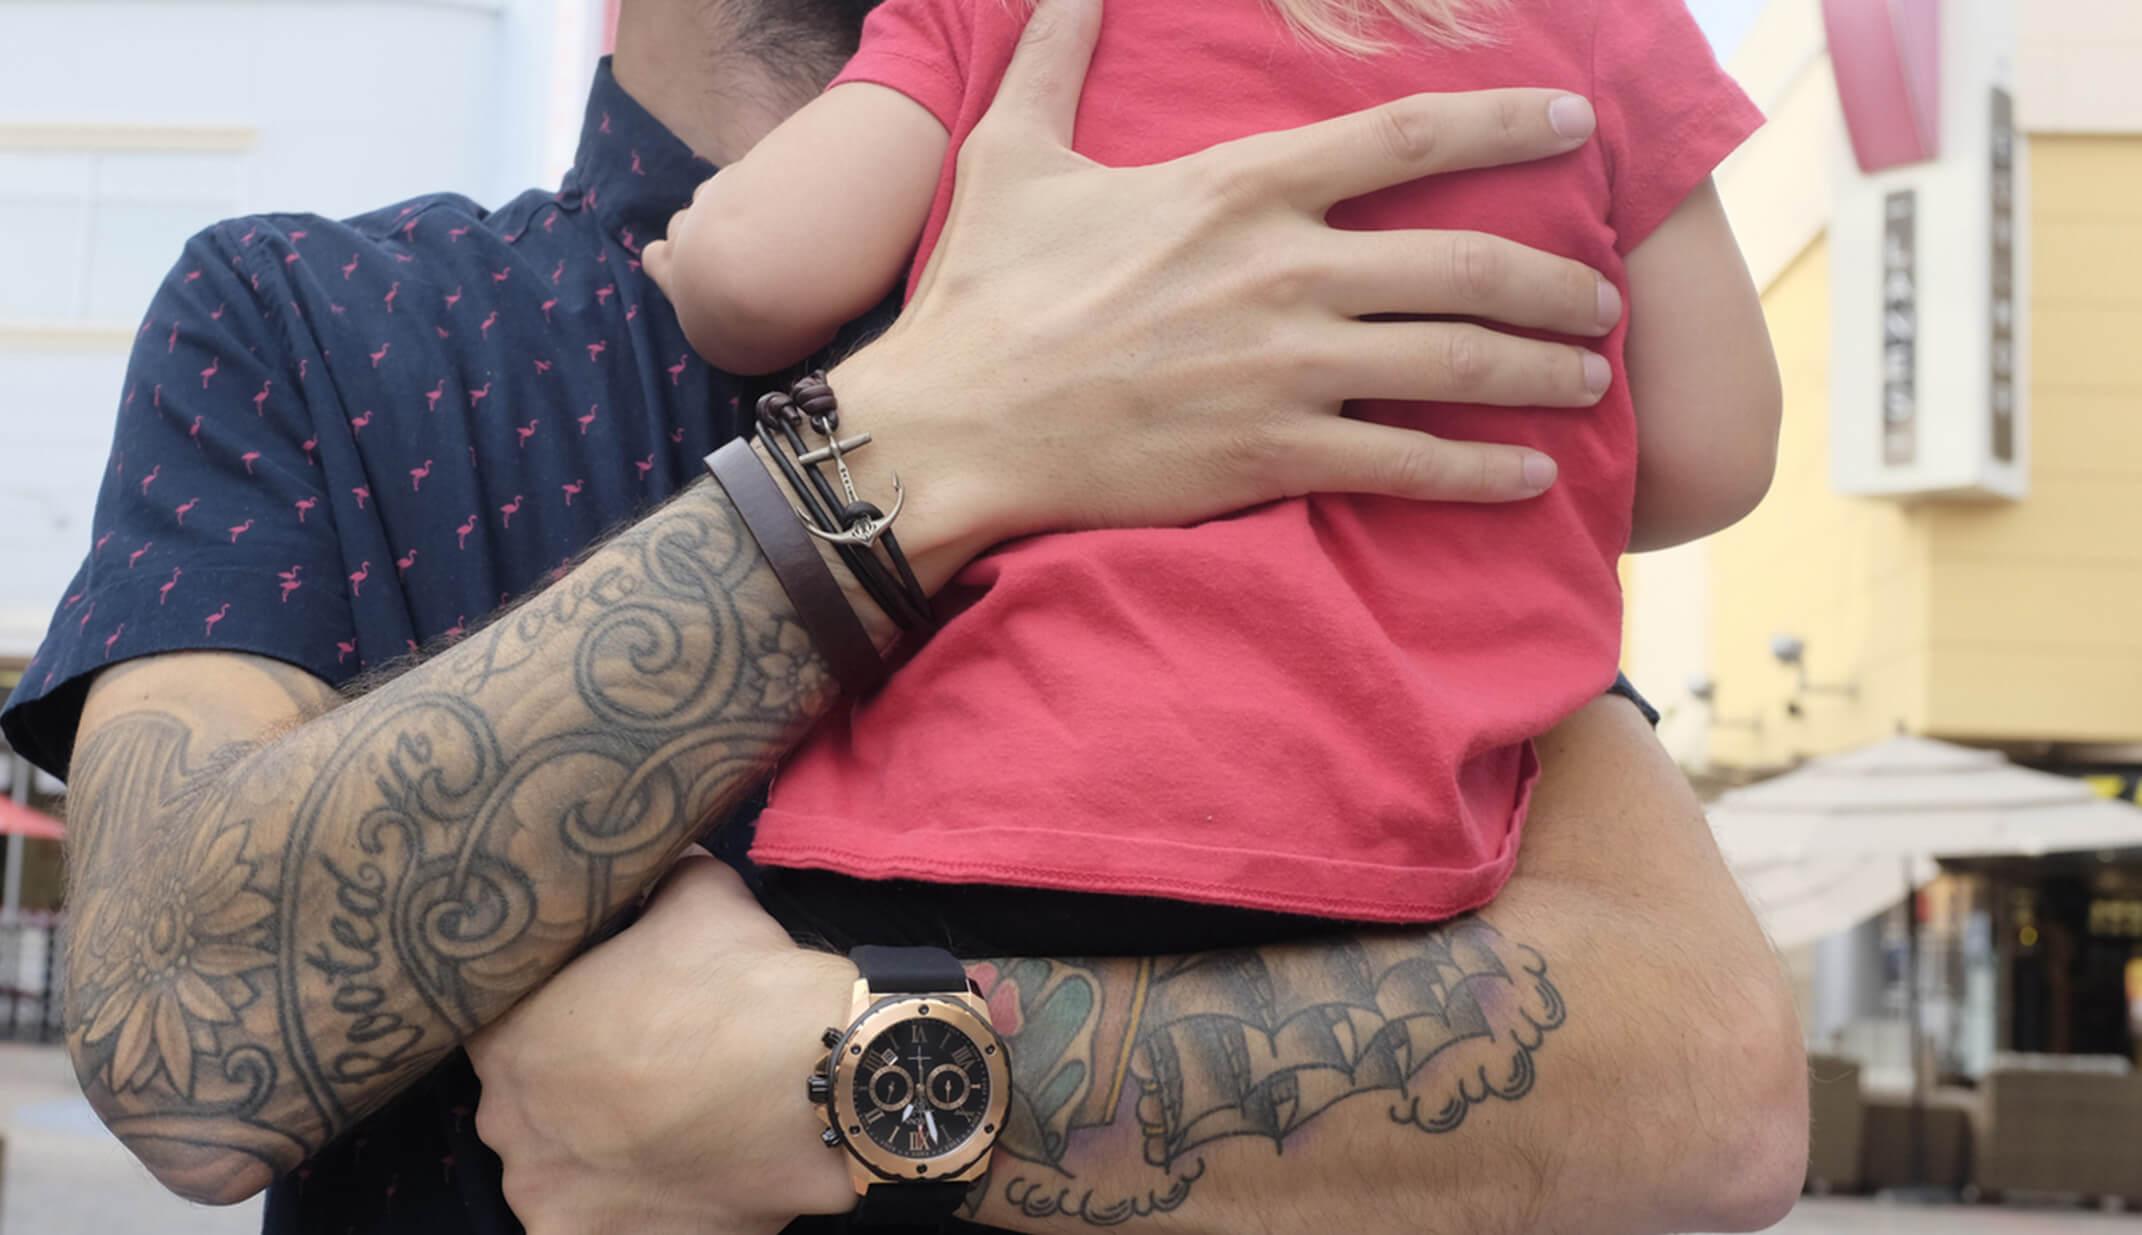 hipster father holding daughter watch hand tattoos shirt town portrait street men family love hug hands freelance bulova UGC content